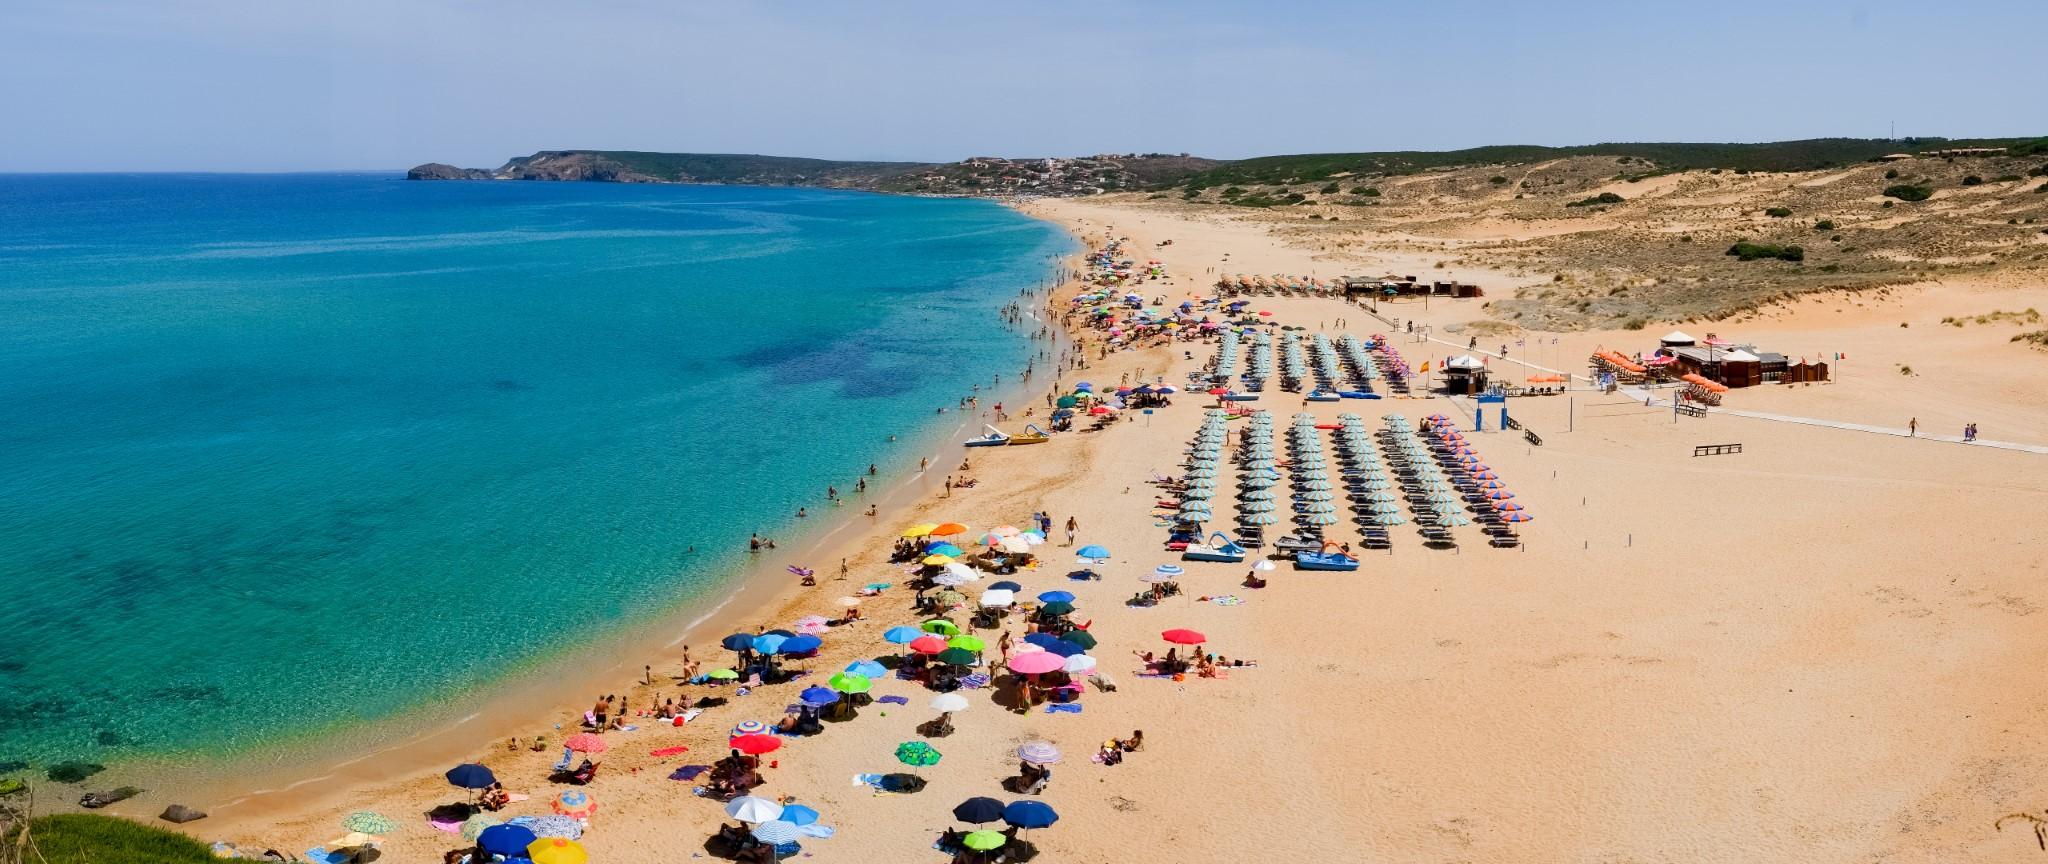 Panorama of Torre dei Corsari beach along Green coast, west Sardinia, Italy